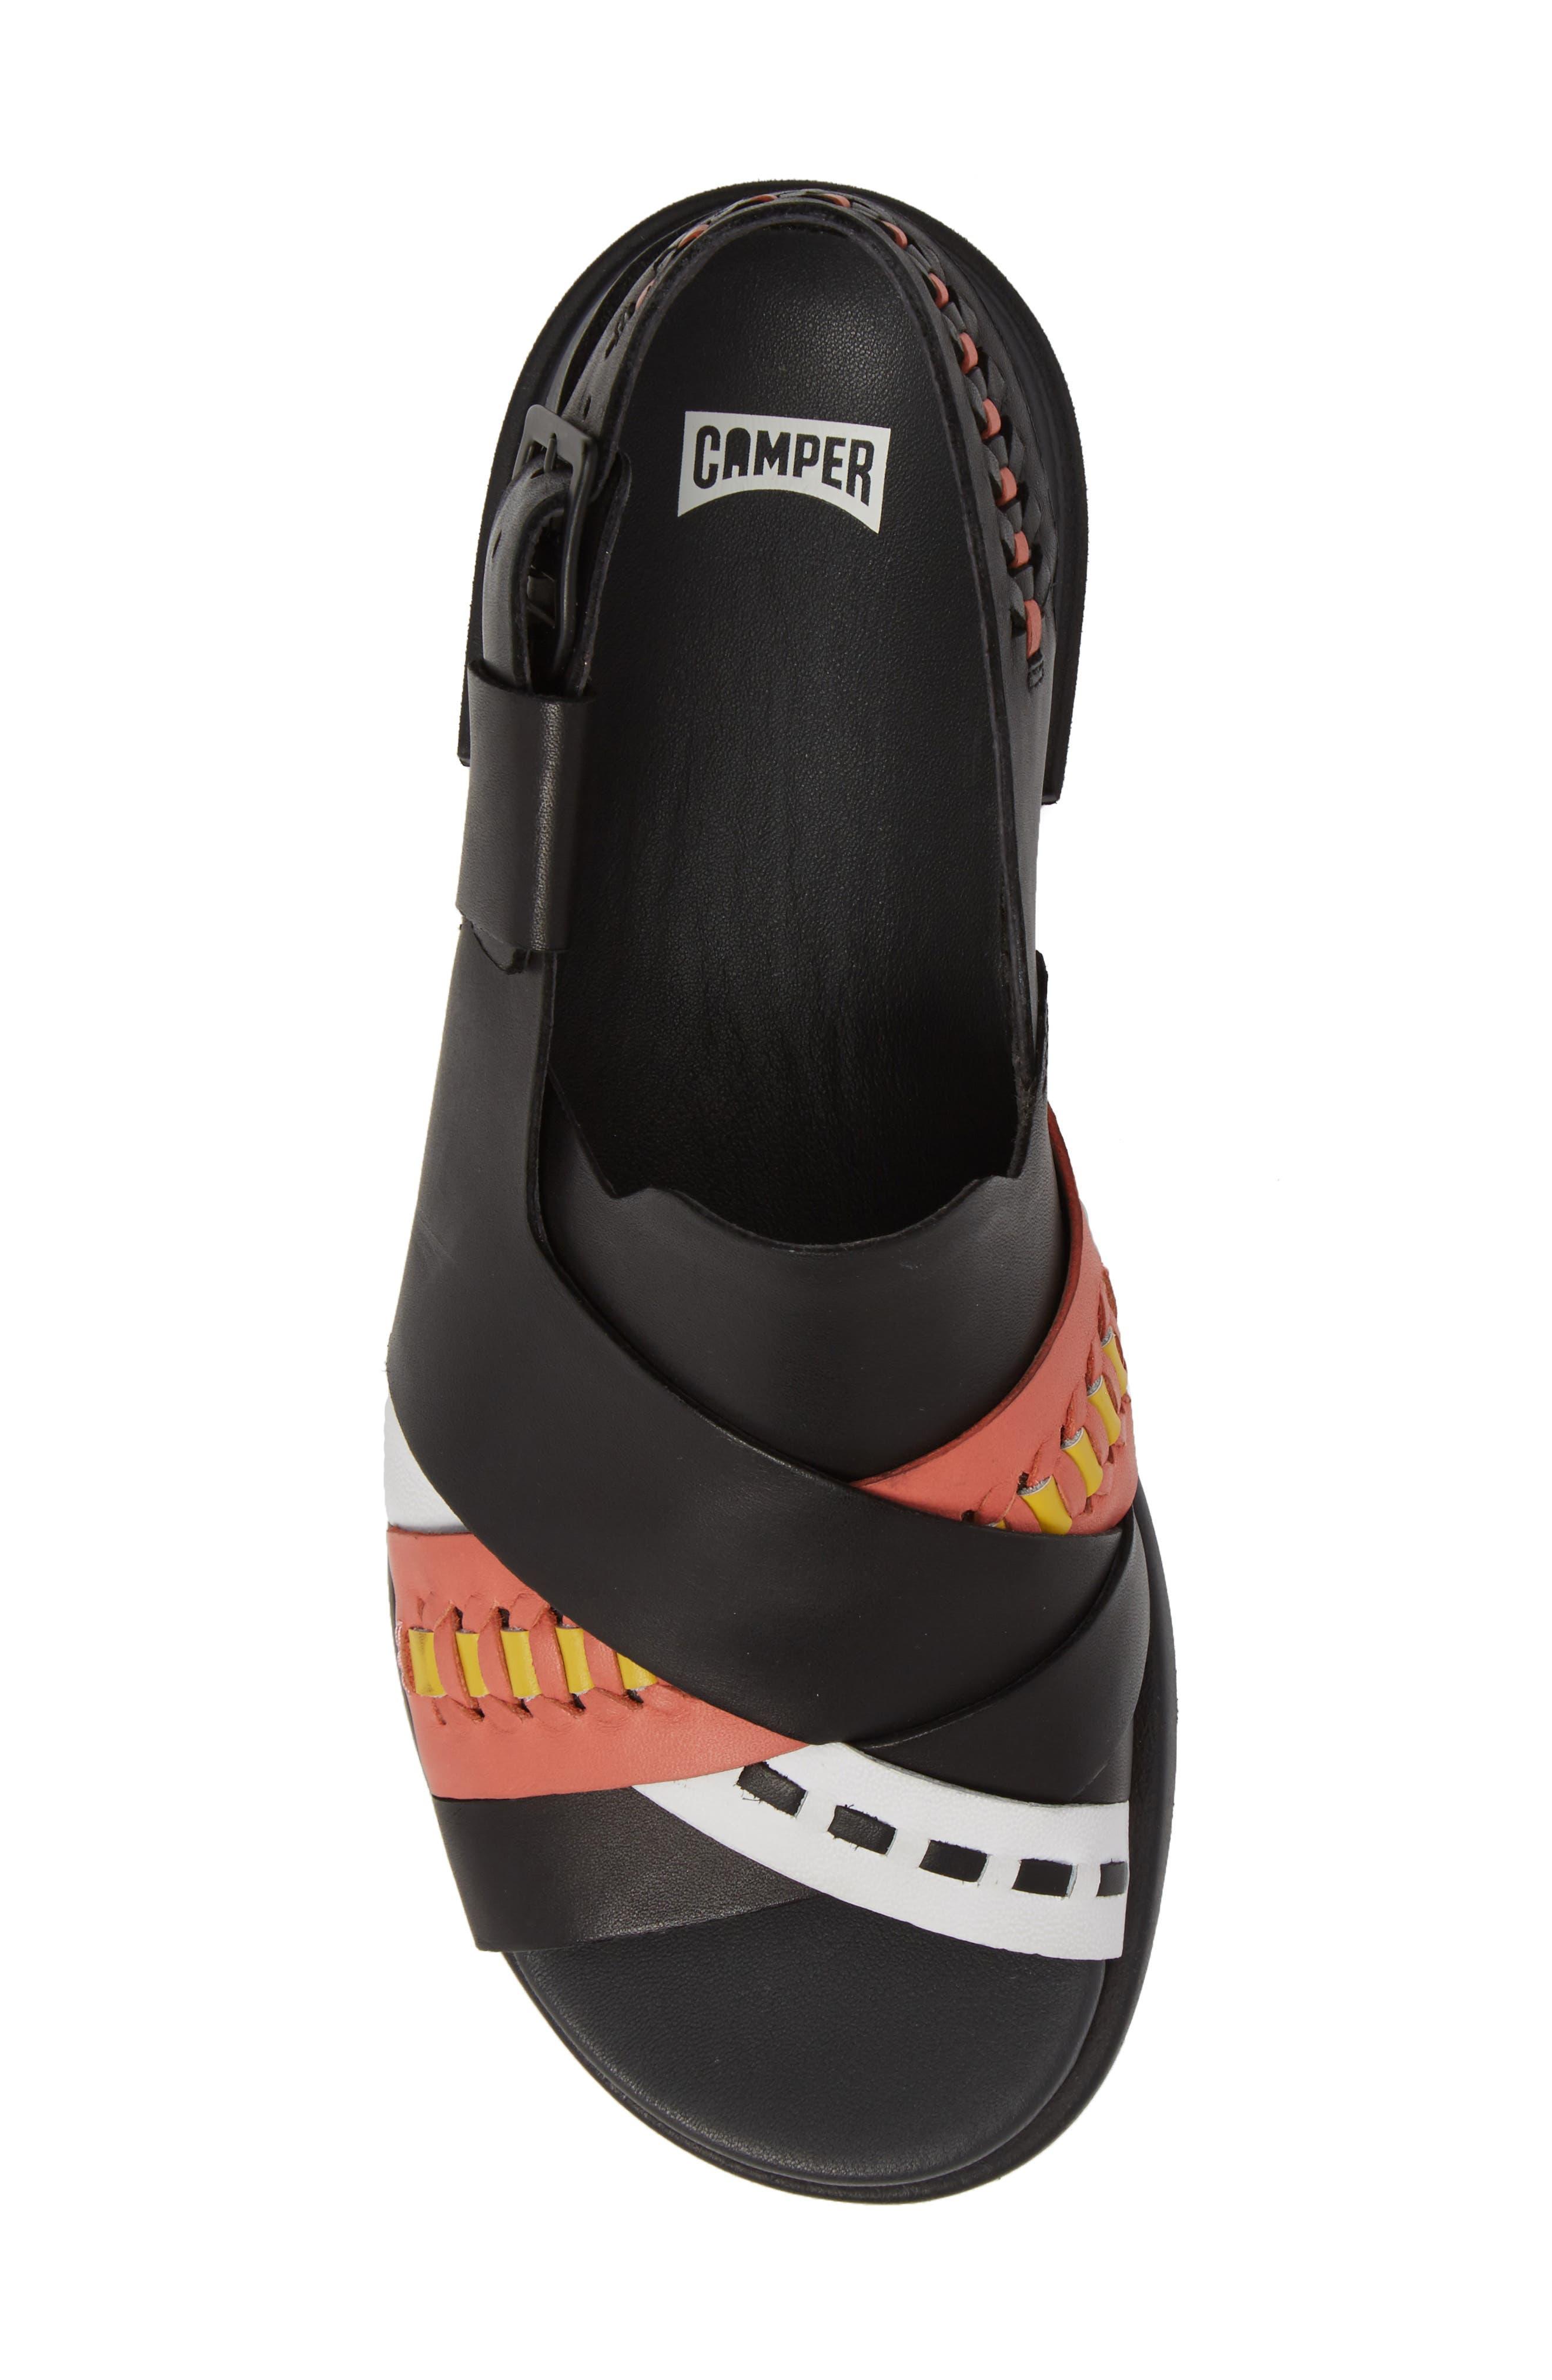 Twins Slingback Sandal,                             Alternate thumbnail 9, color,                             Multi - Assorted Leather